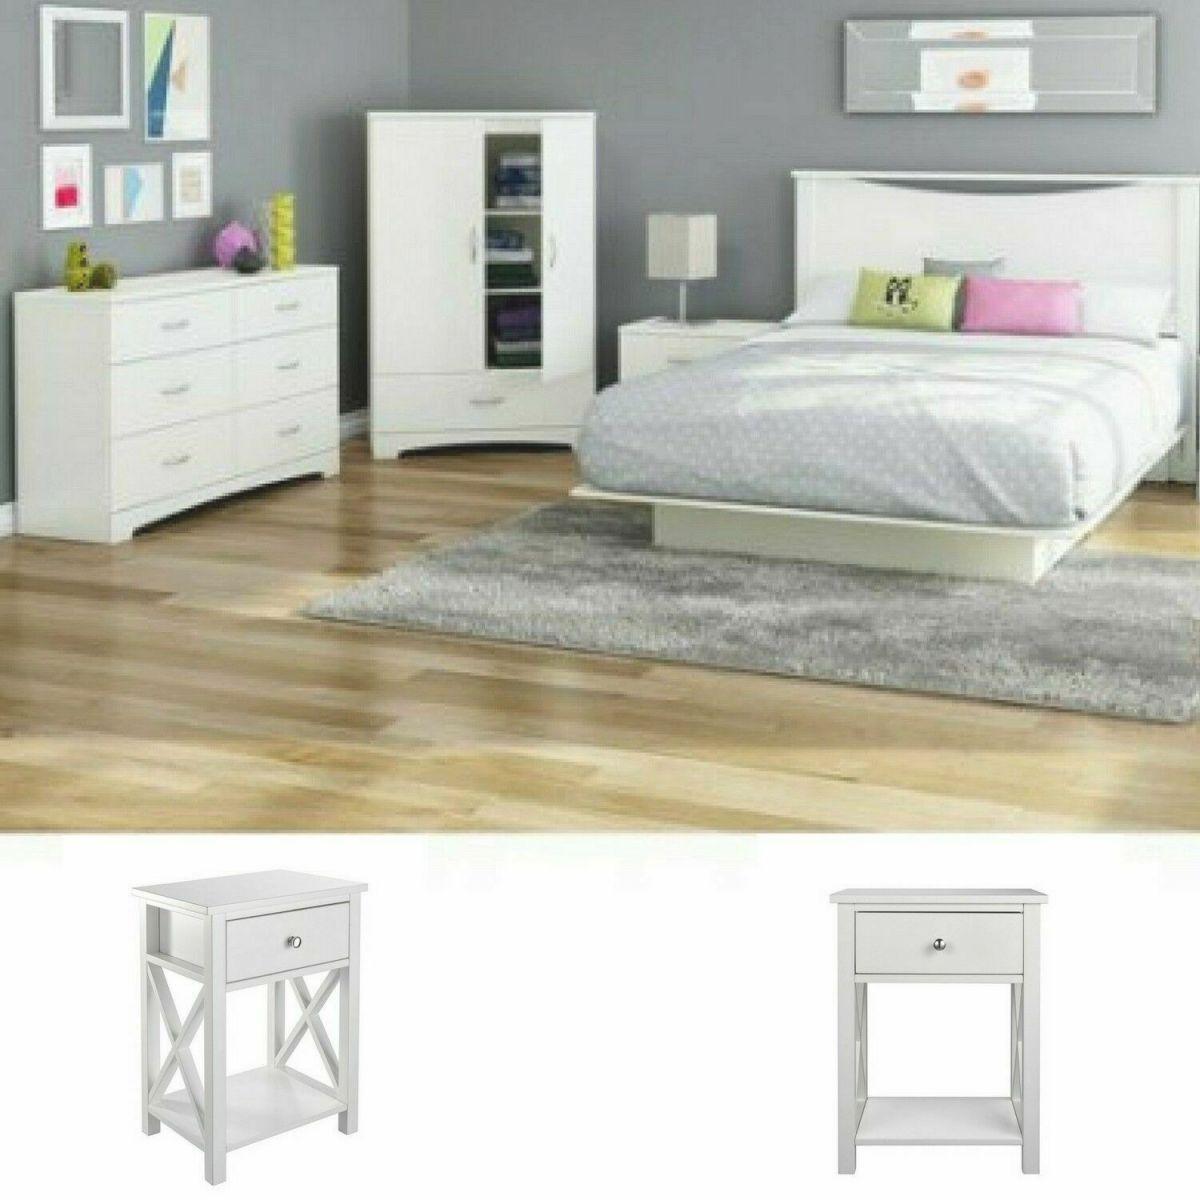 White Full Size Bedroom Set 2 Nightstands Modern Design Furniture Platform Bed with regard to Luxury Full Size Bedroom Furniture Sets